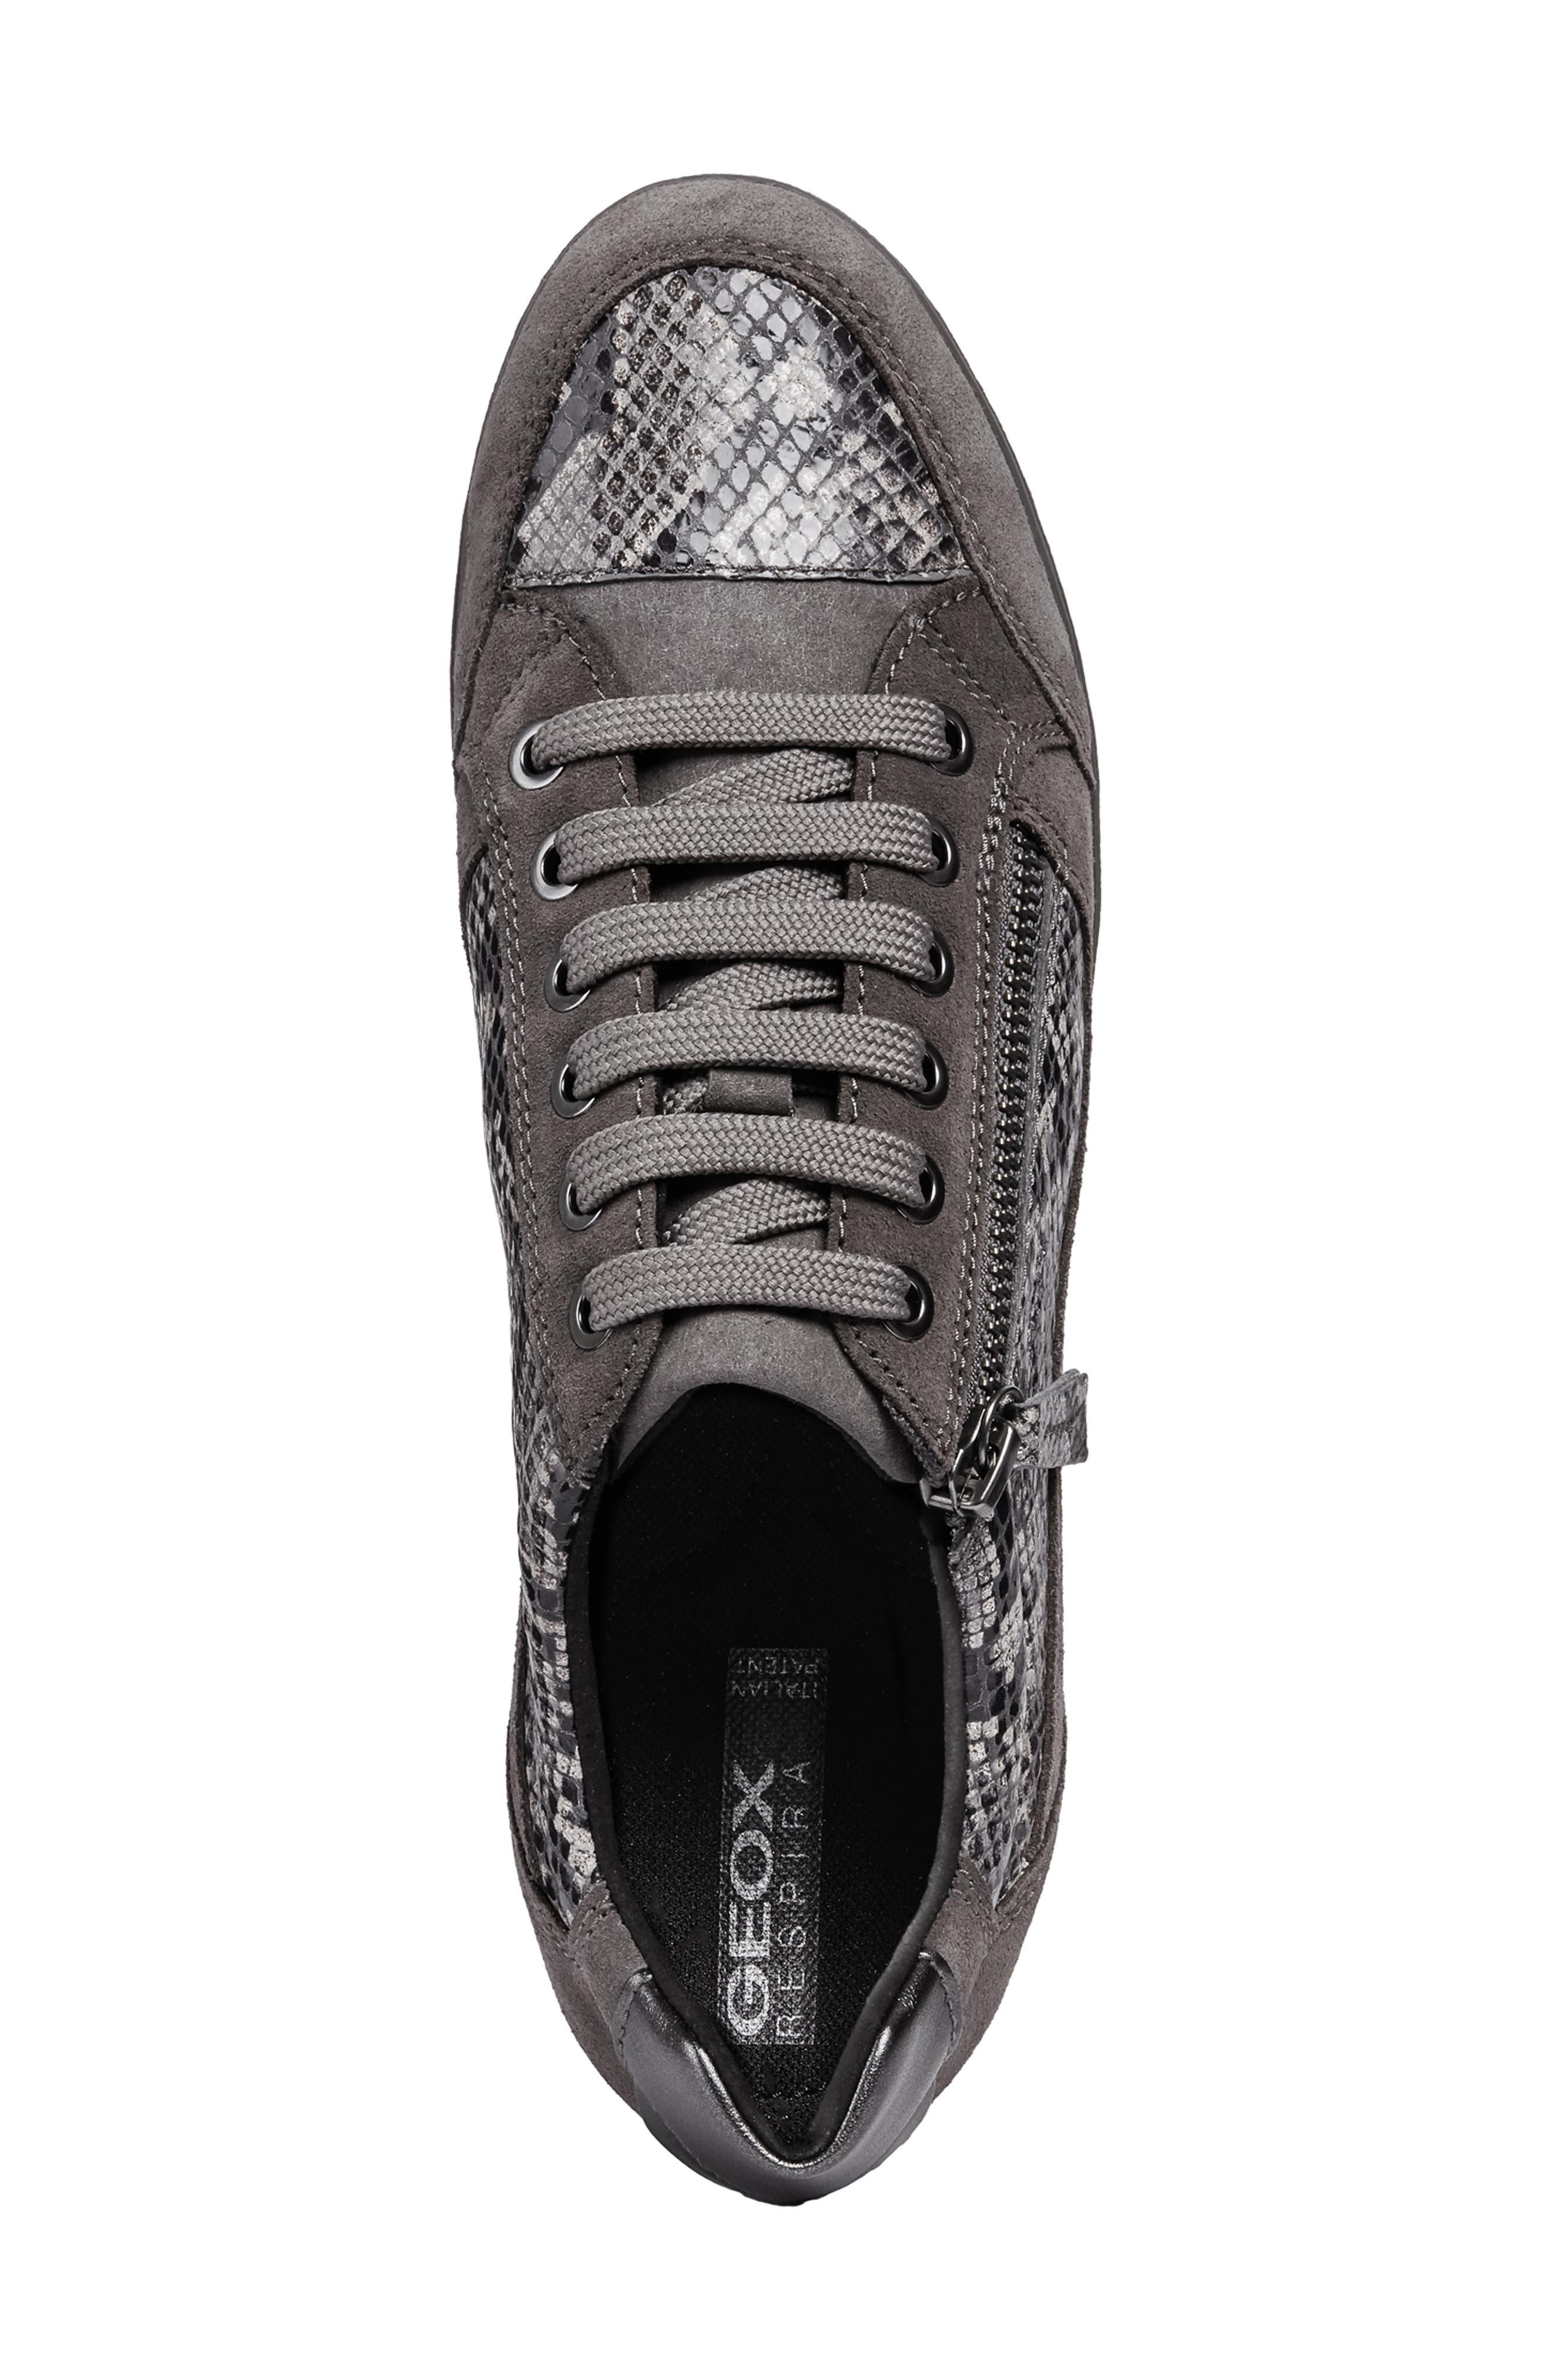 Myria Sneaker,                             Alternate thumbnail 4, color,                             DARK GREY SUEDE